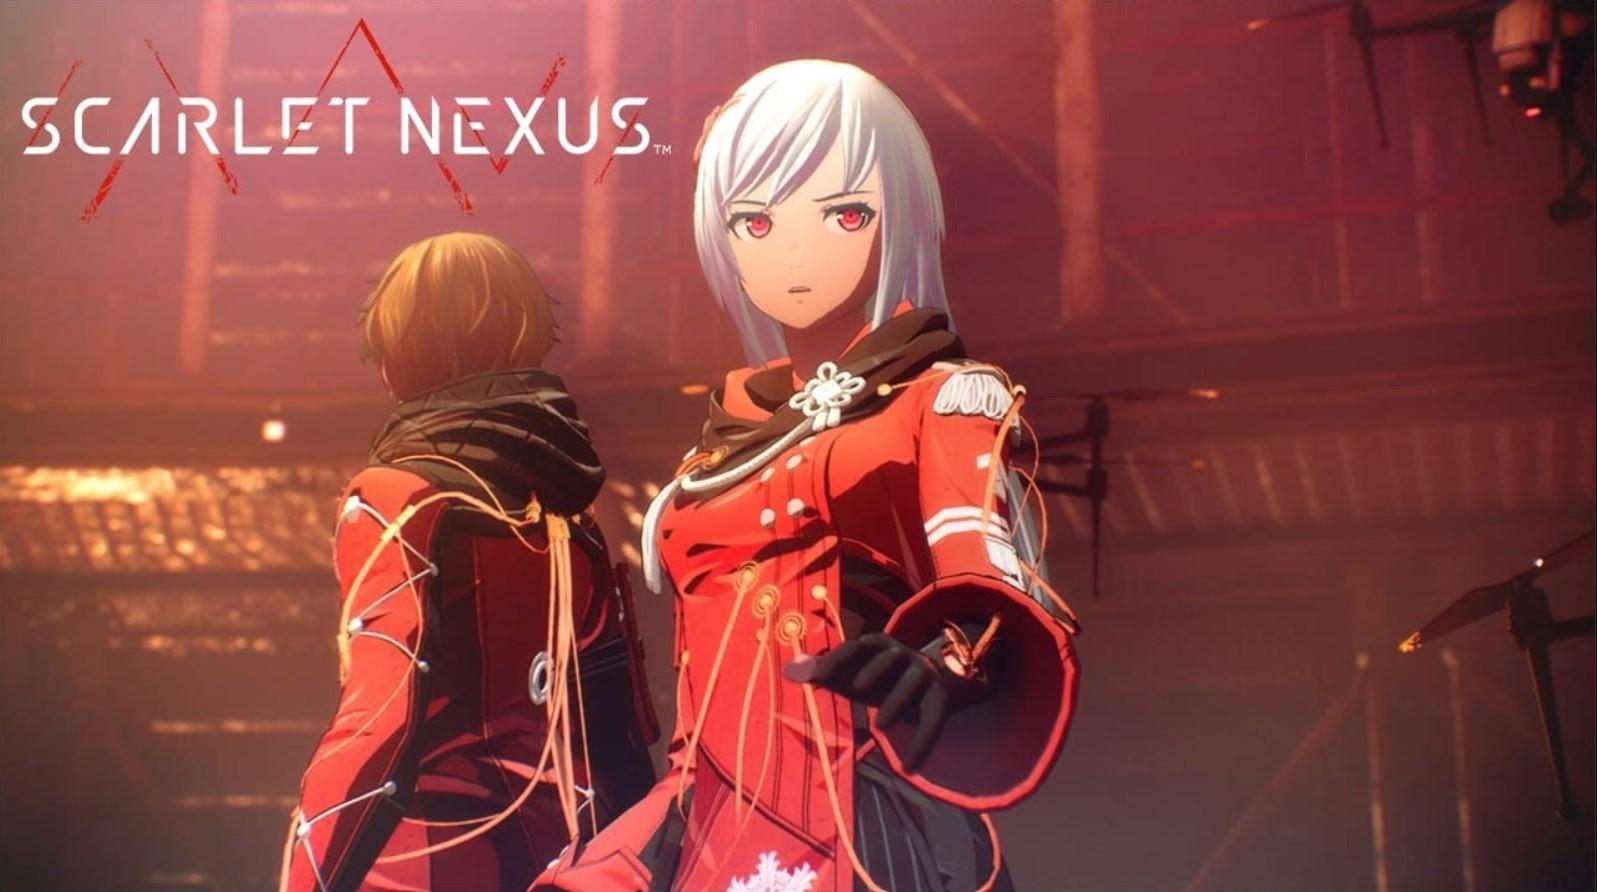 Scarlet nexus Pc Full Game With Crack Free Download